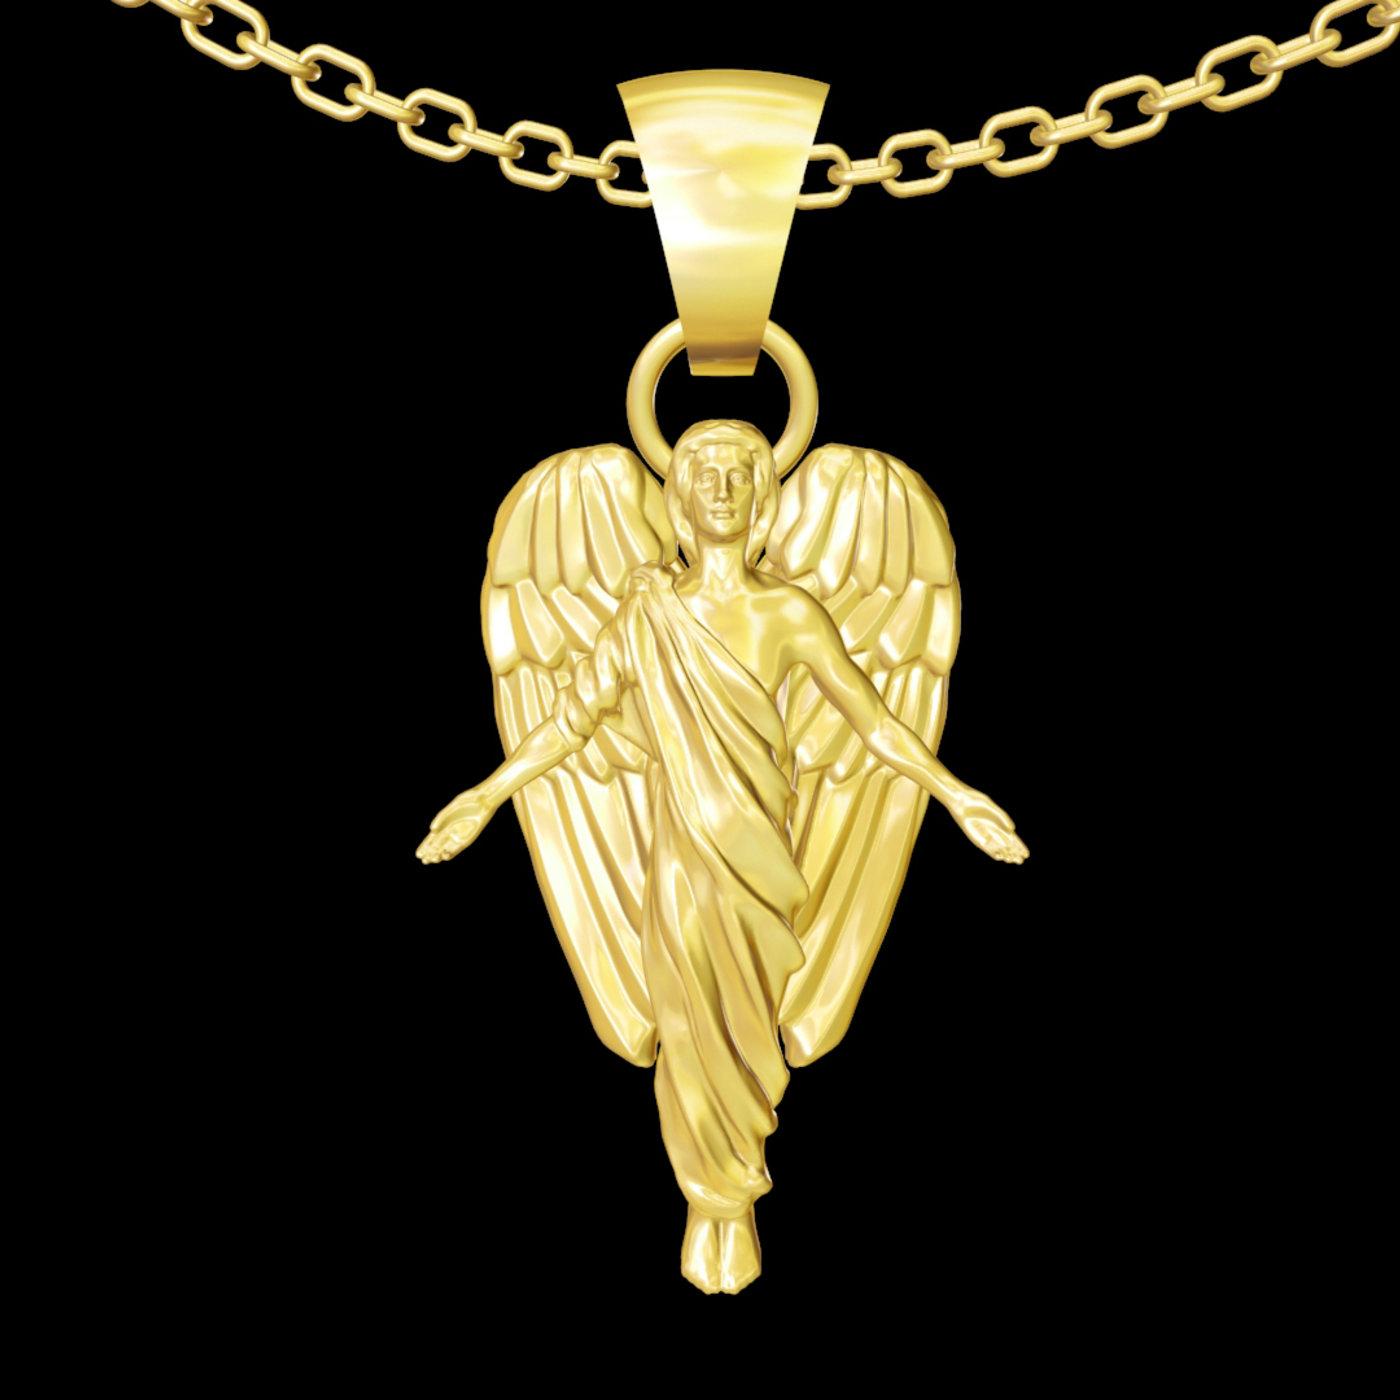 Angel Man pendant jewelry gold necklace medallion 3D print model